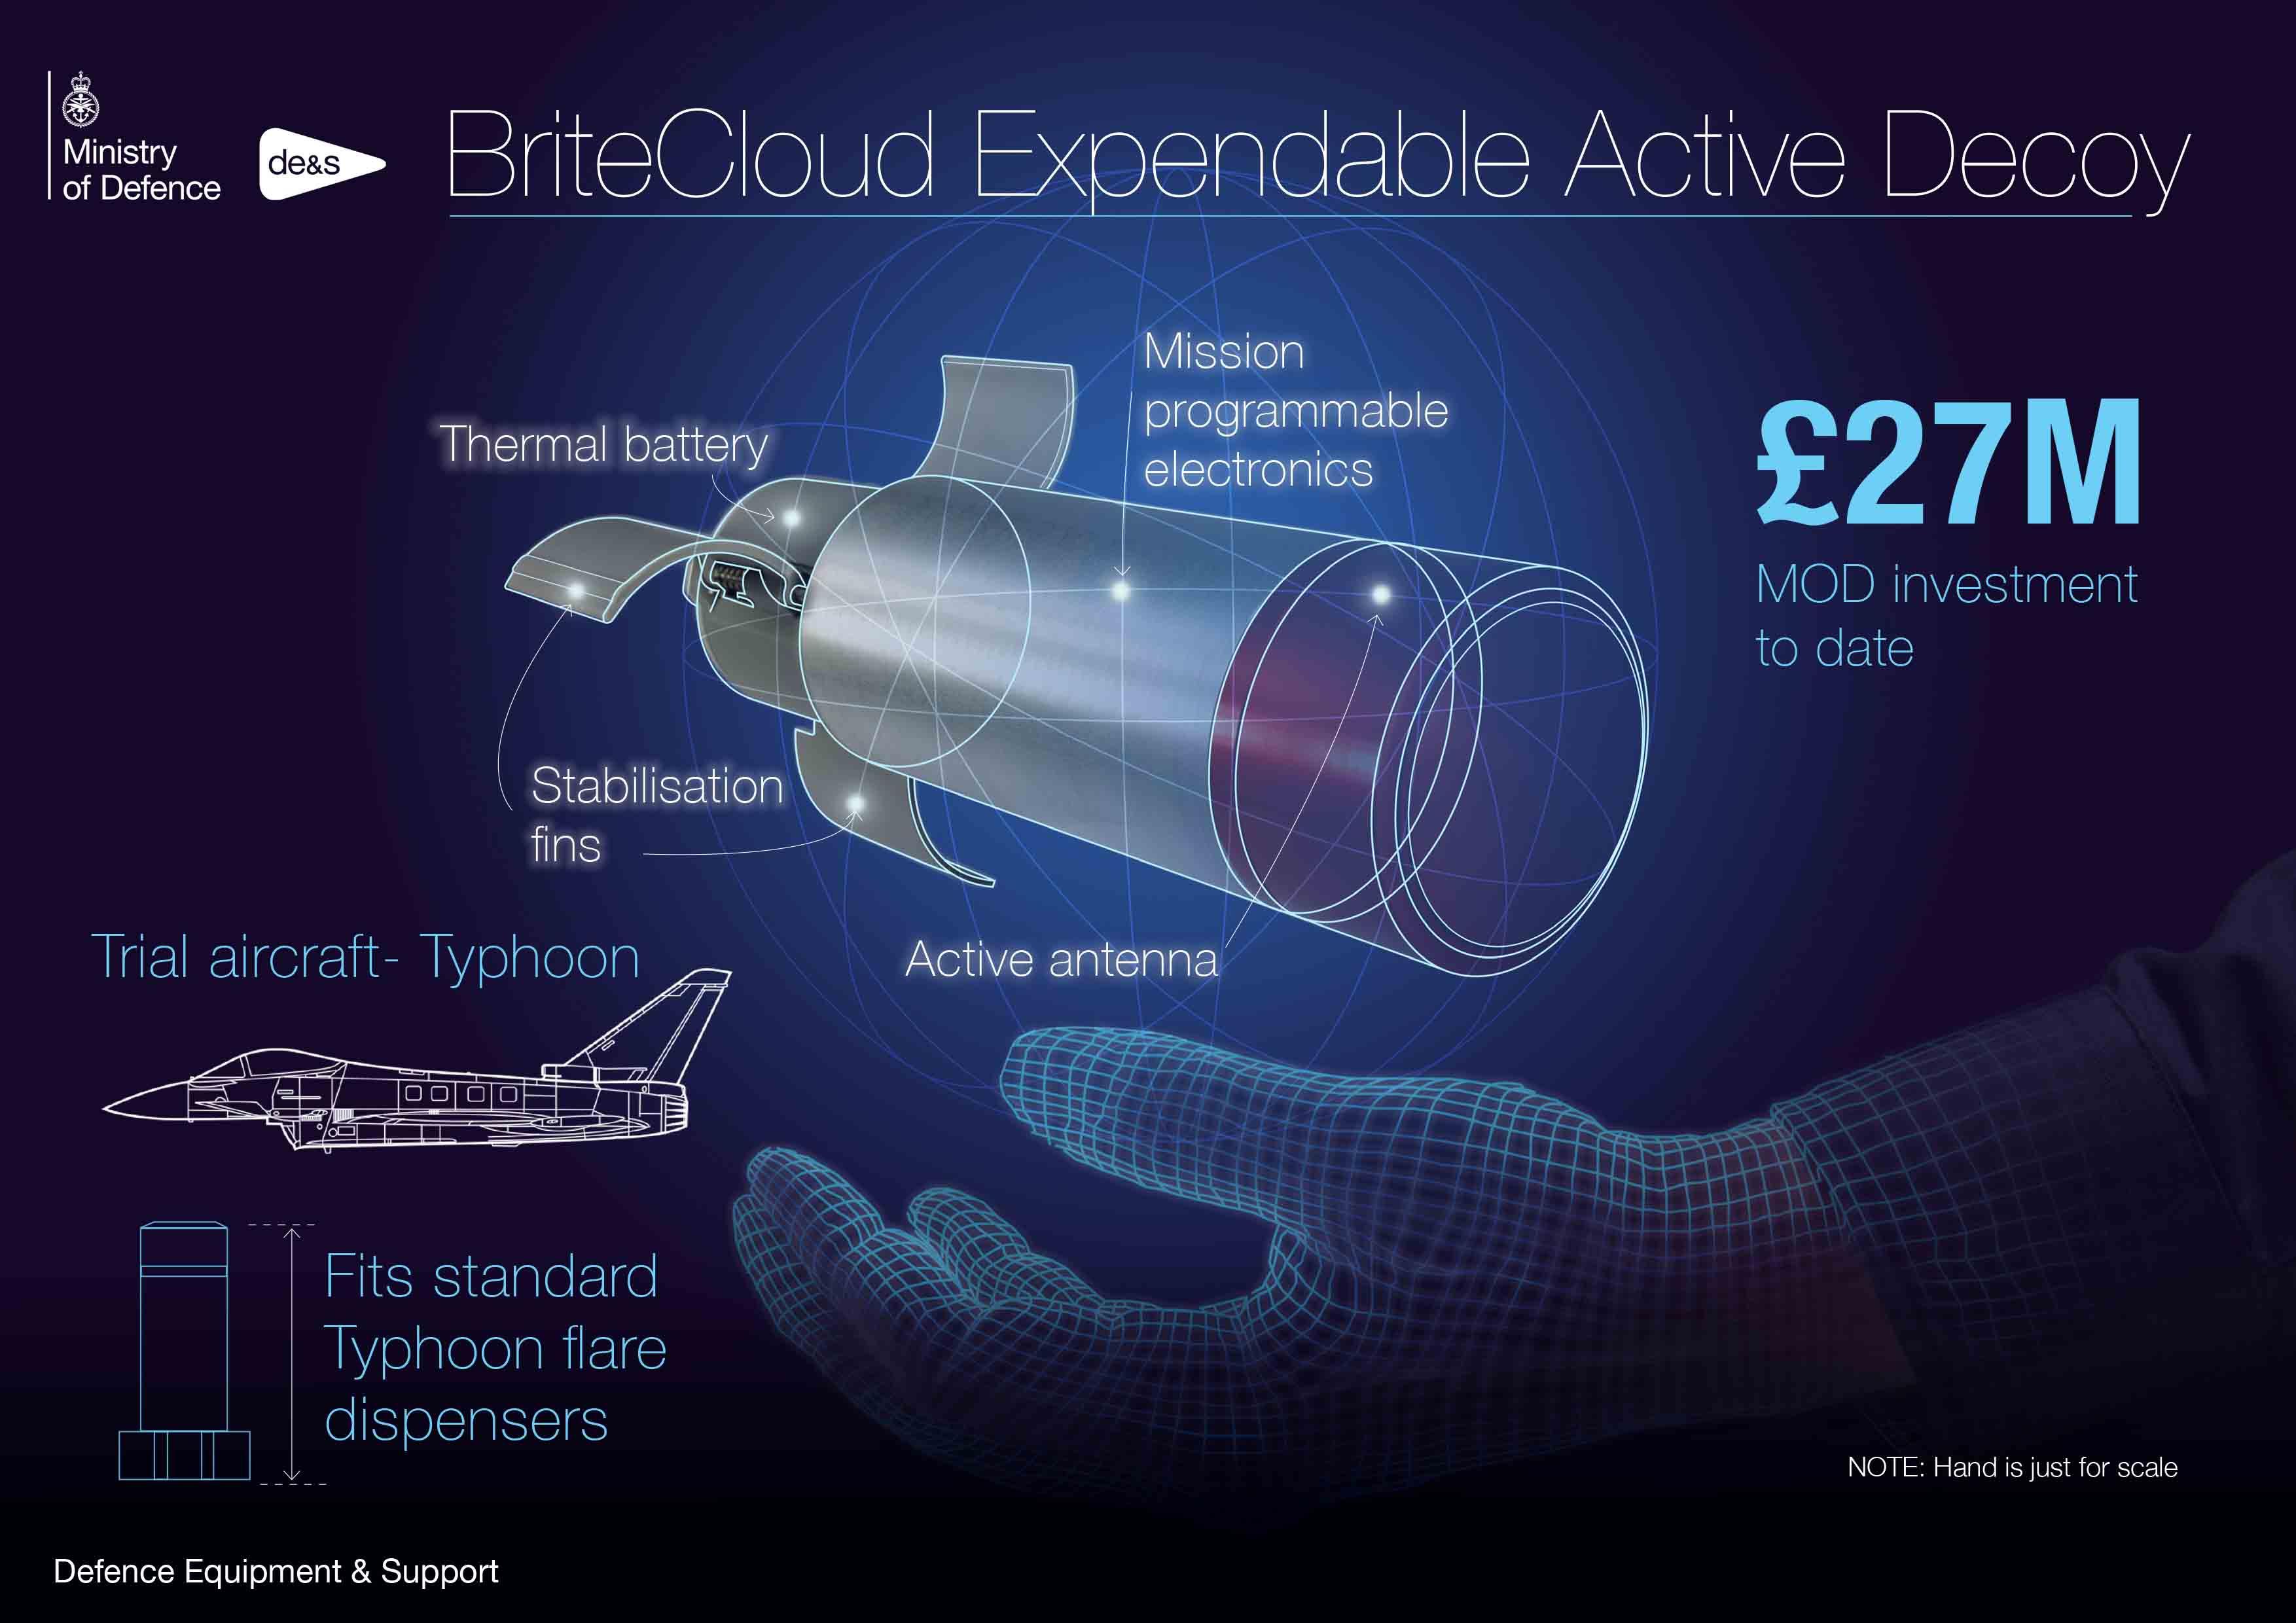 BriteCloud Expendable Active Decoy (EAD)